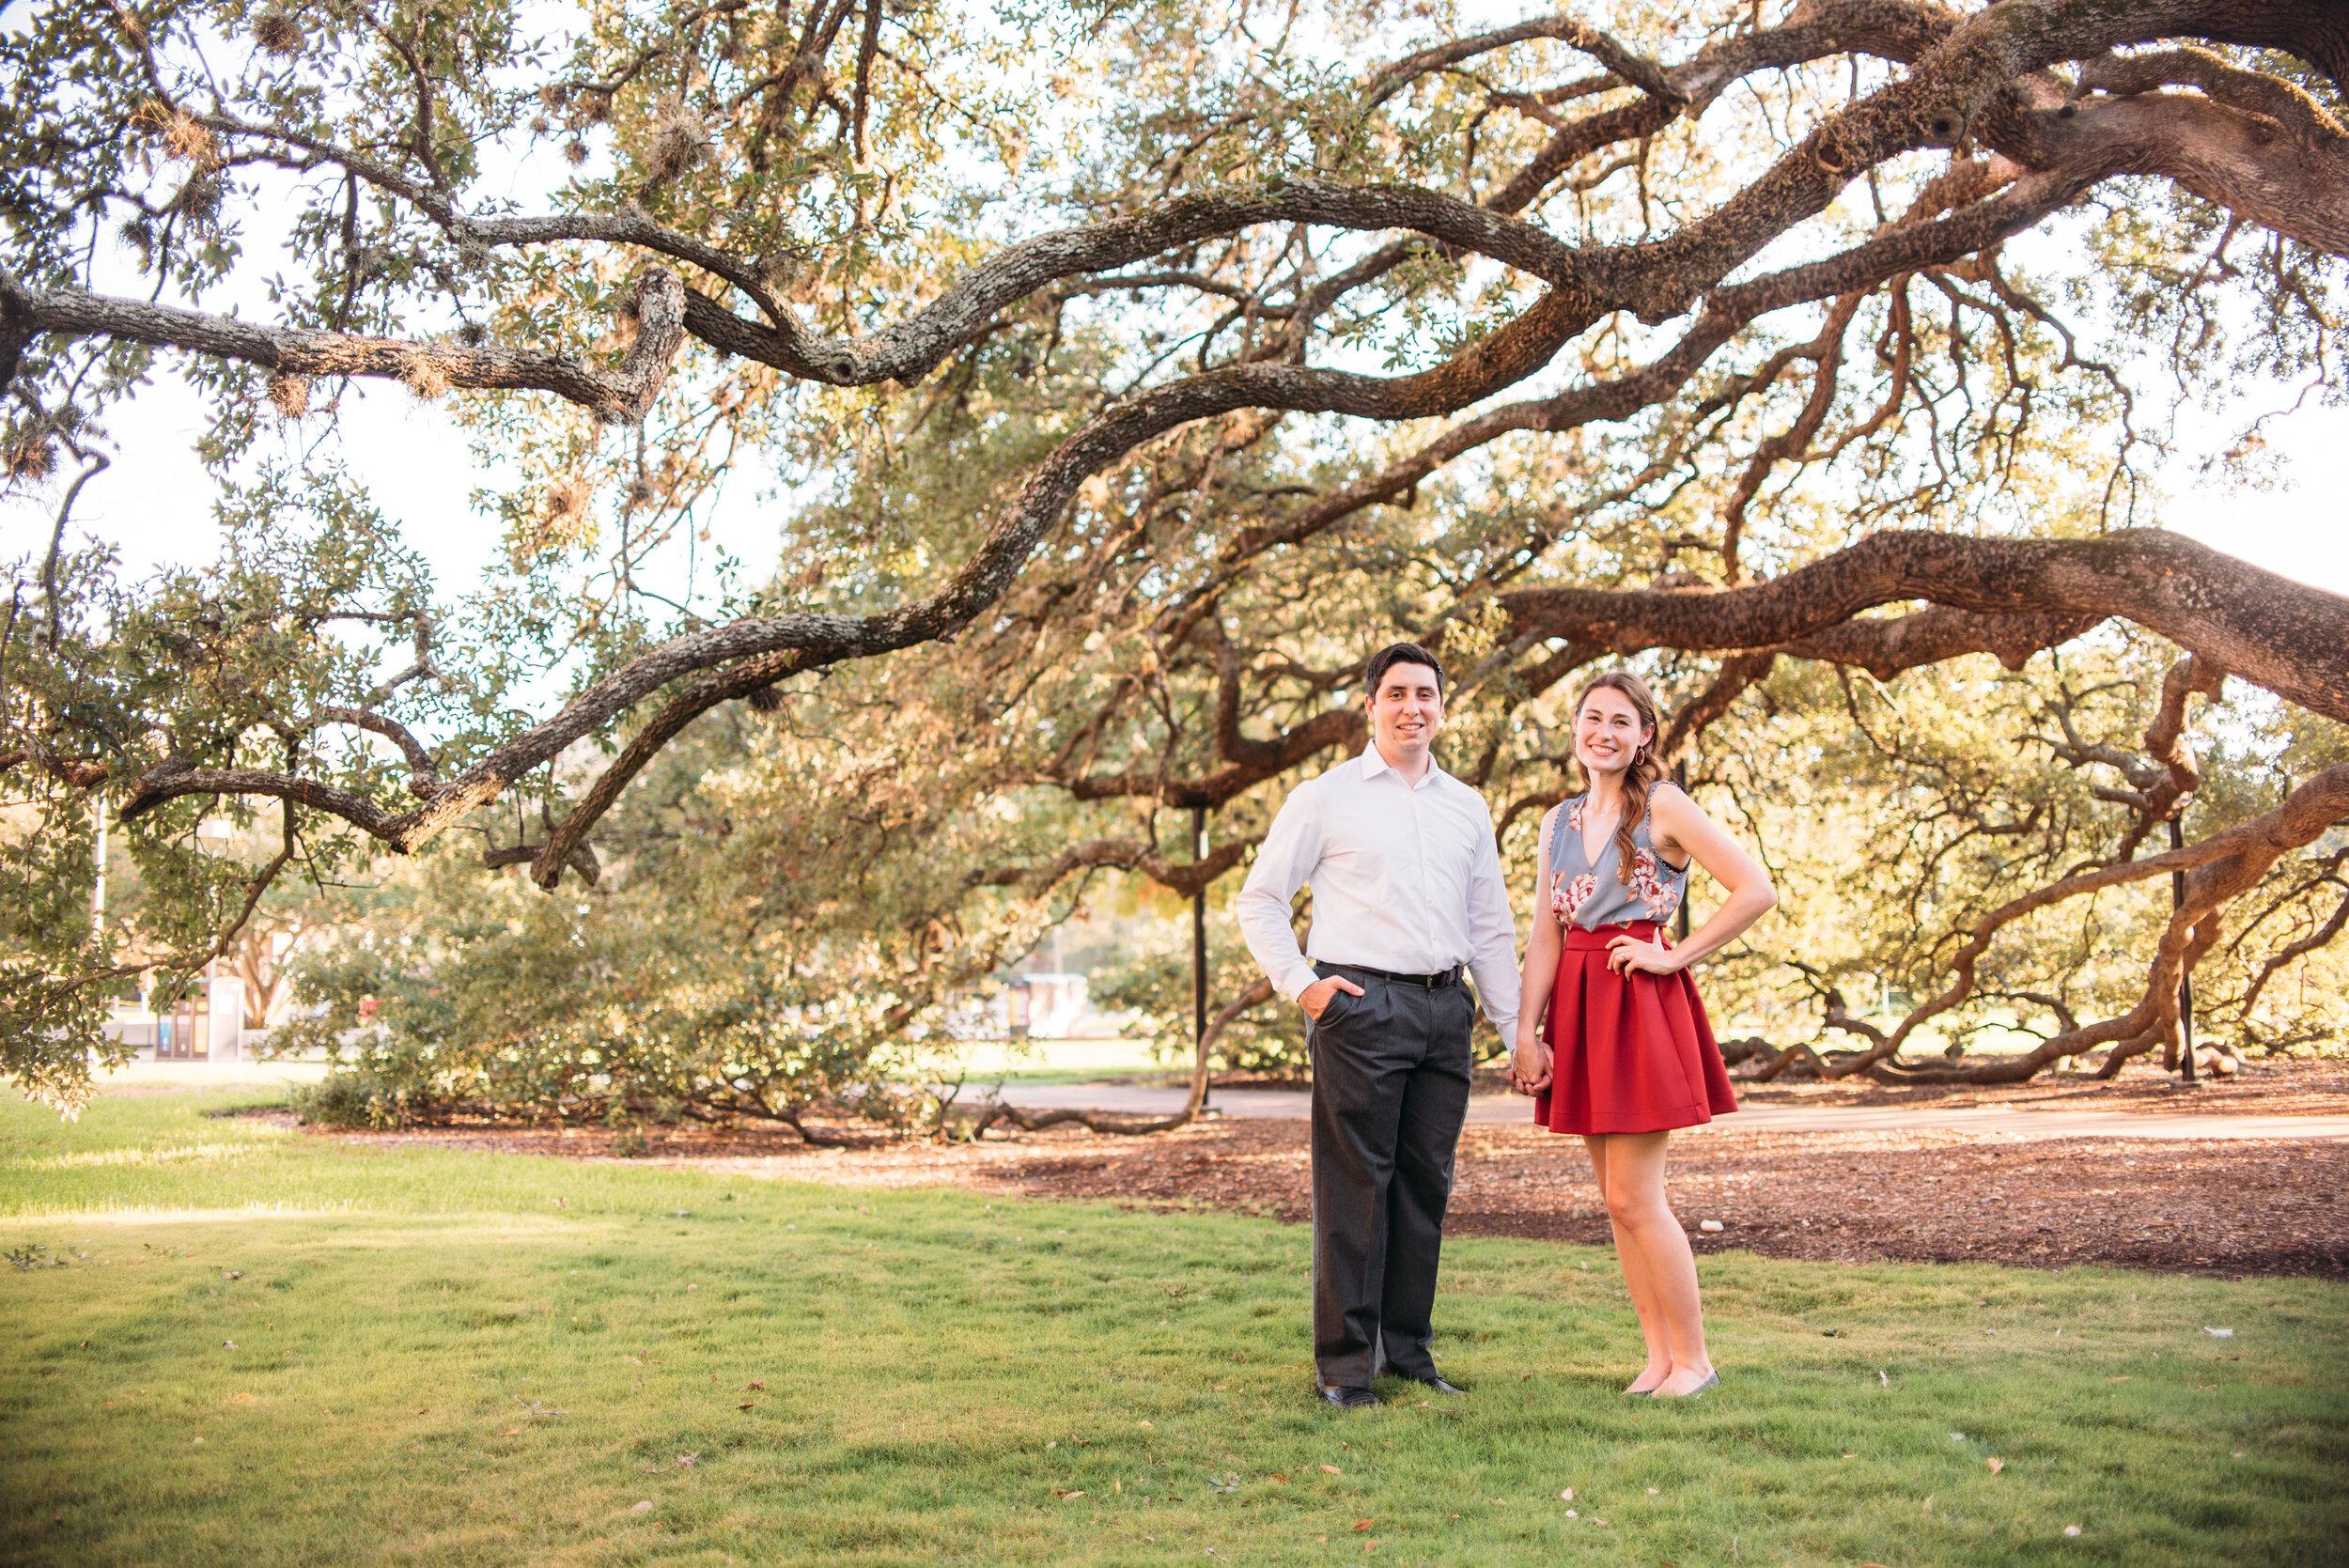 Texas-A&M-University-Engagement-Session-Century-Tree-Military-Walk-College-Station-Wedding-Photographer-San-Angel-Photo-Tony-Kate-07.jpg